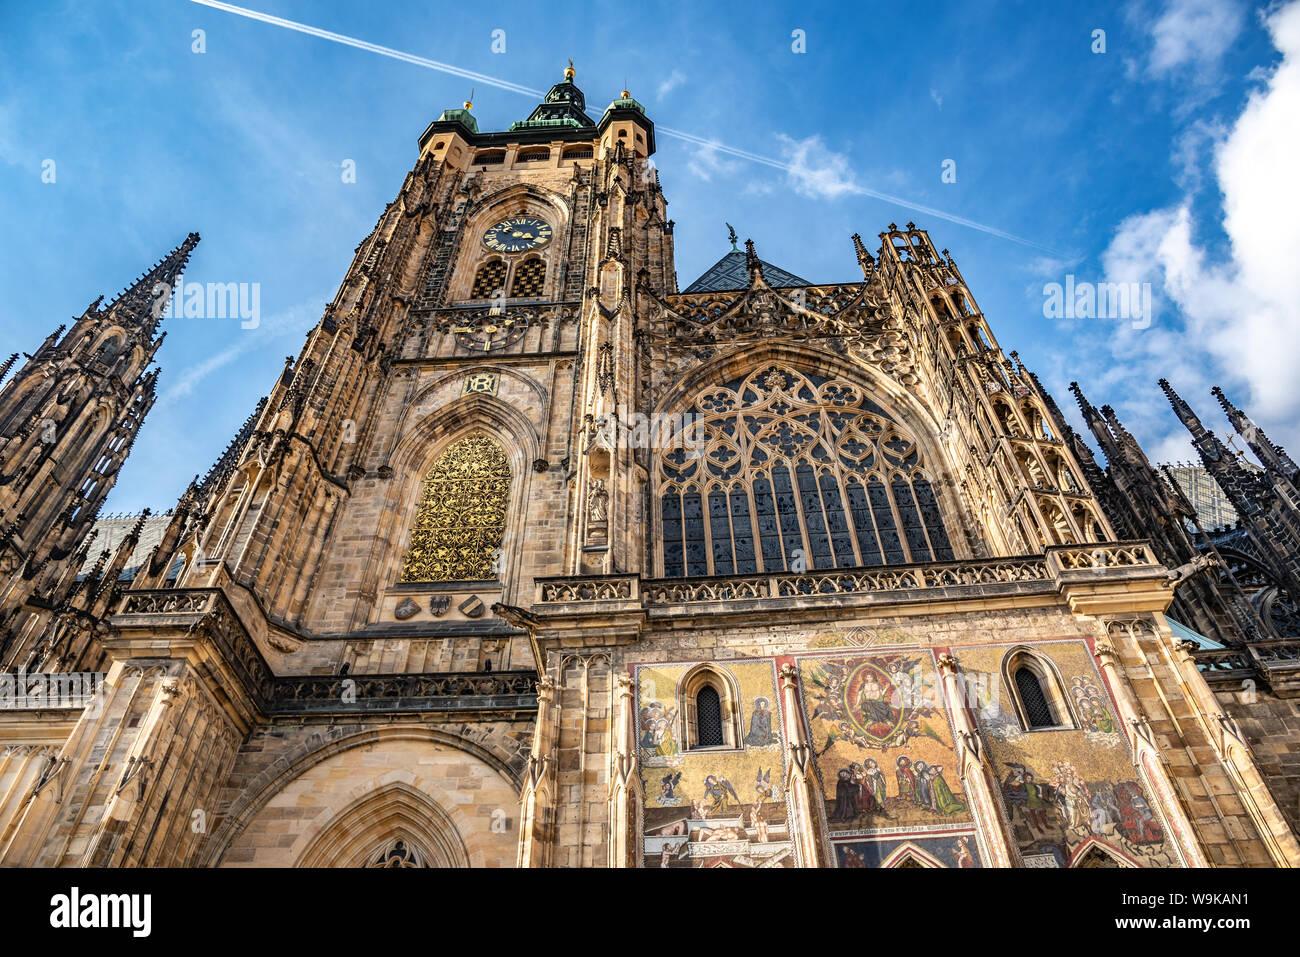 St. Vitus Cathedral. Prague, Czech Republic. Stock Photo